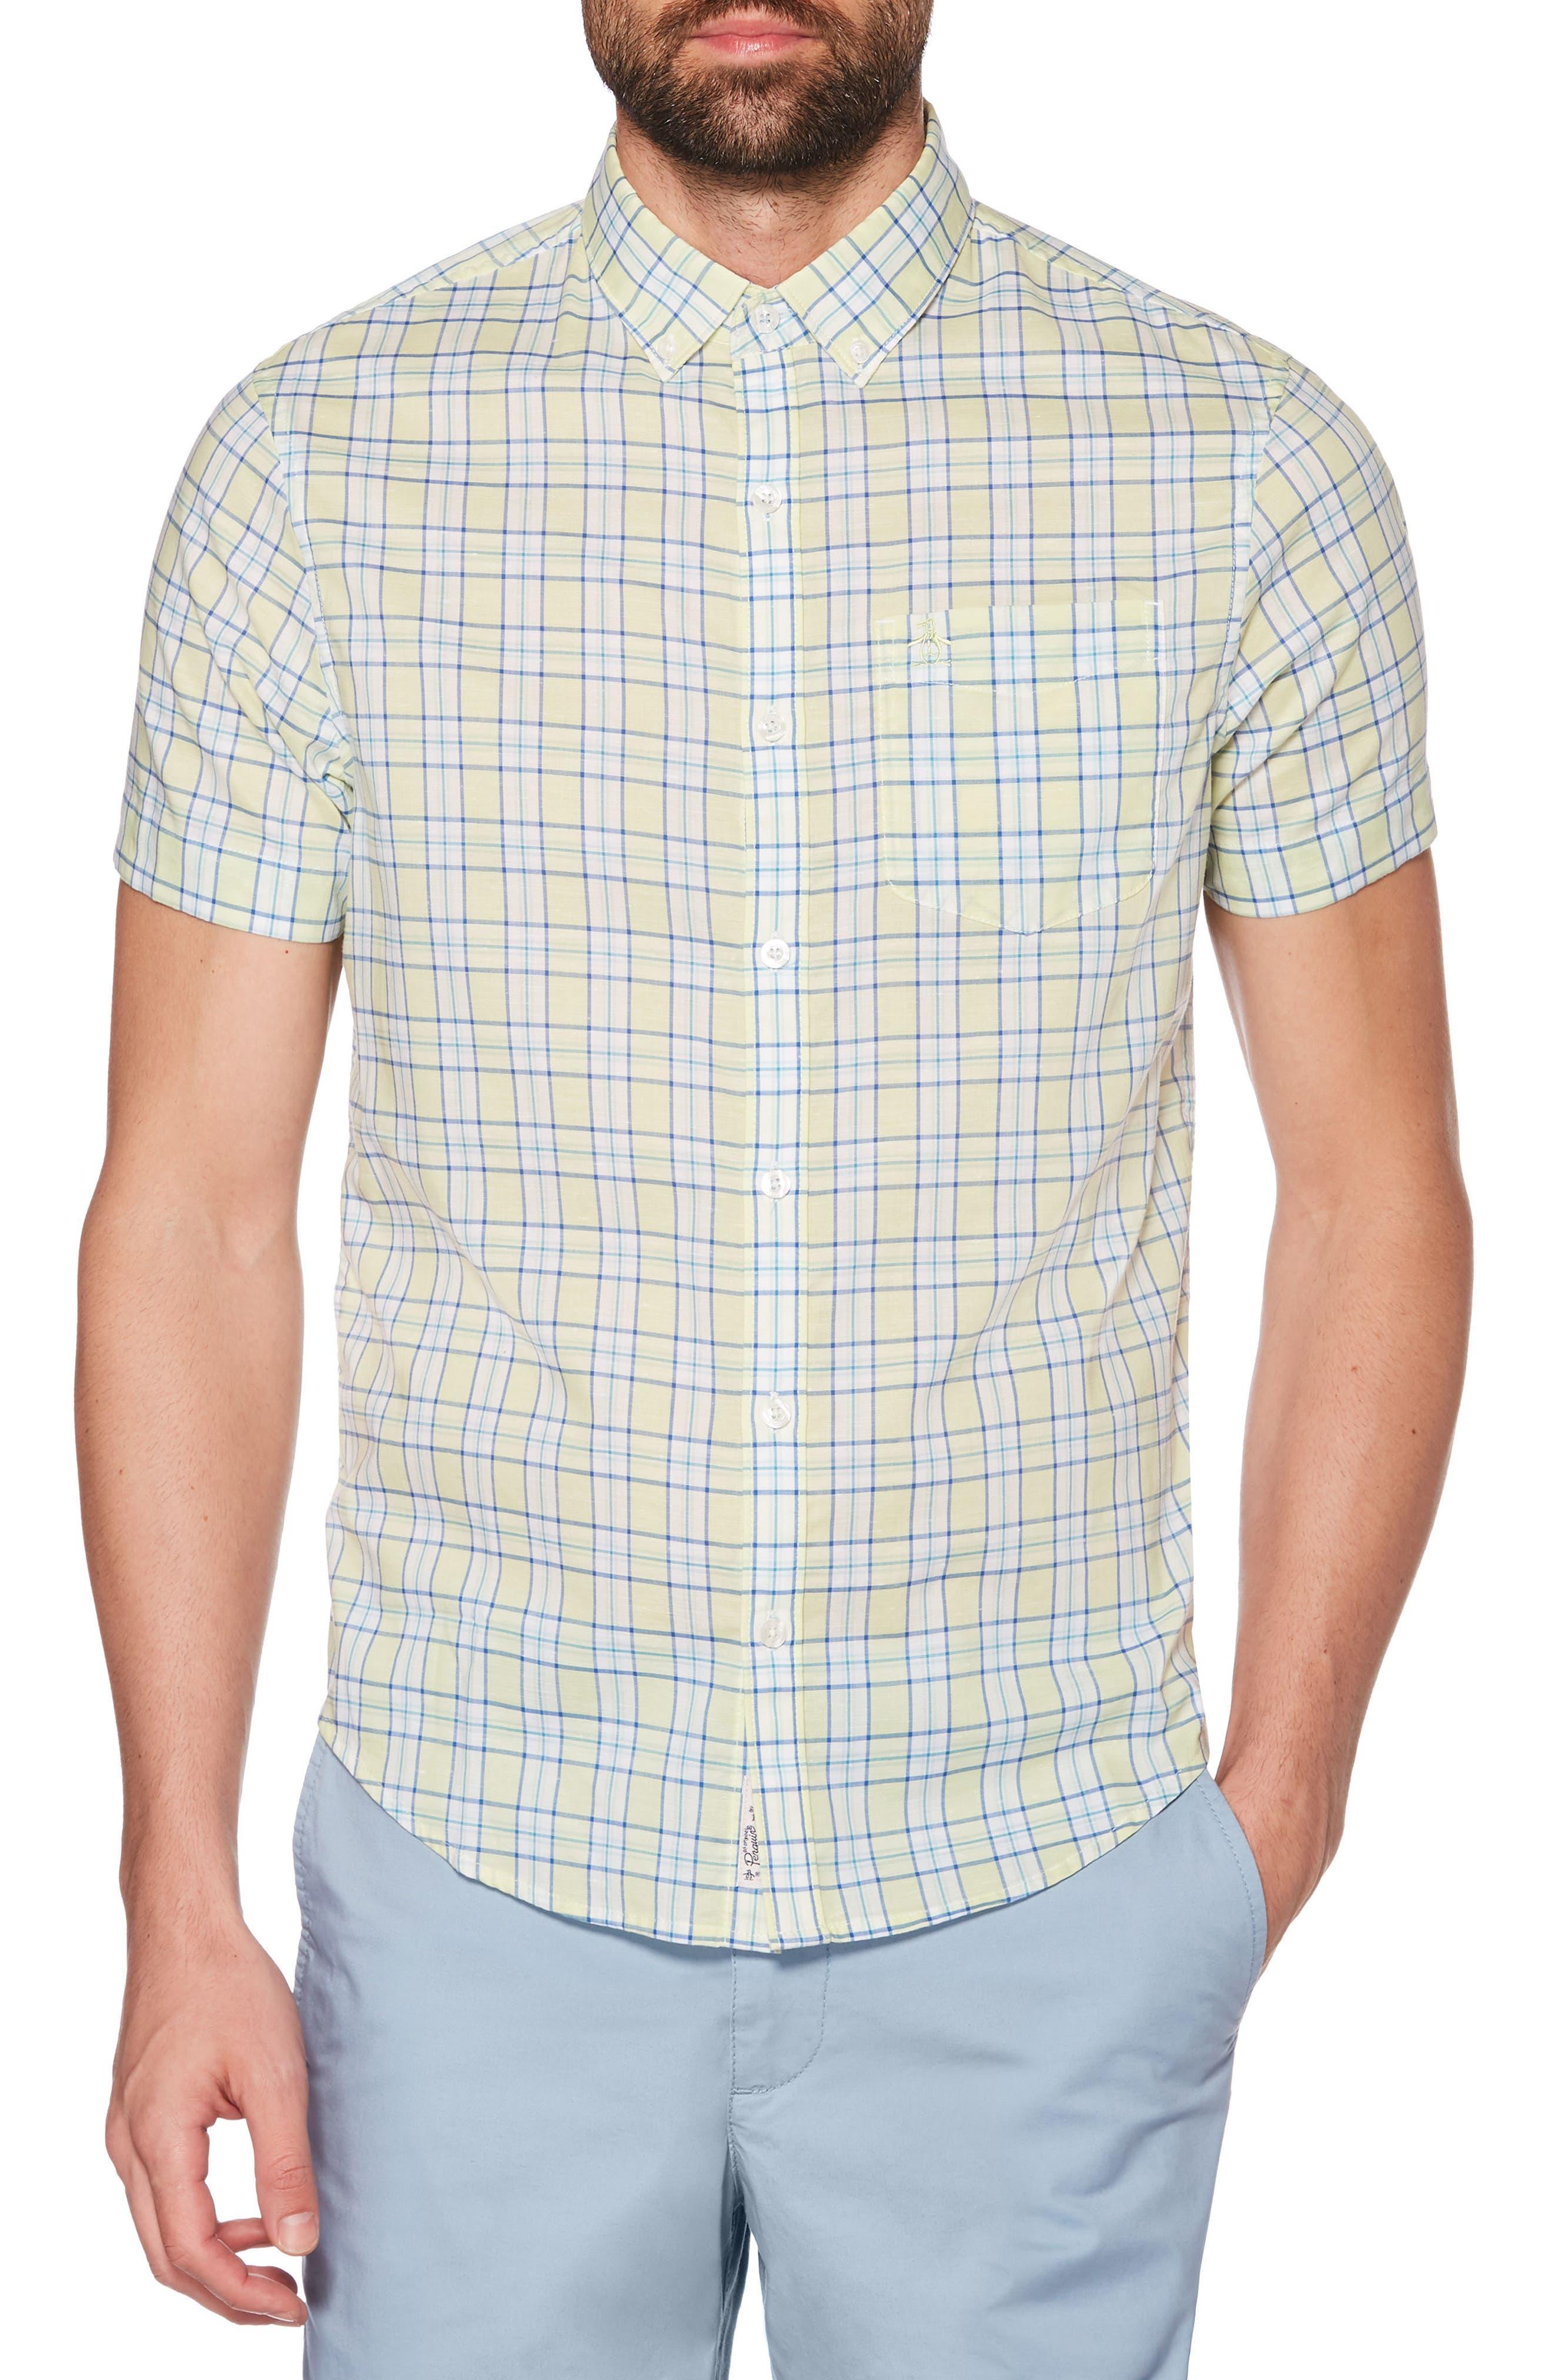 ORIGINAL PENGUIN, Heritage Slim Fit Stretch Plaid Shirt, Main thumbnail 1, color, BUTTERFLY